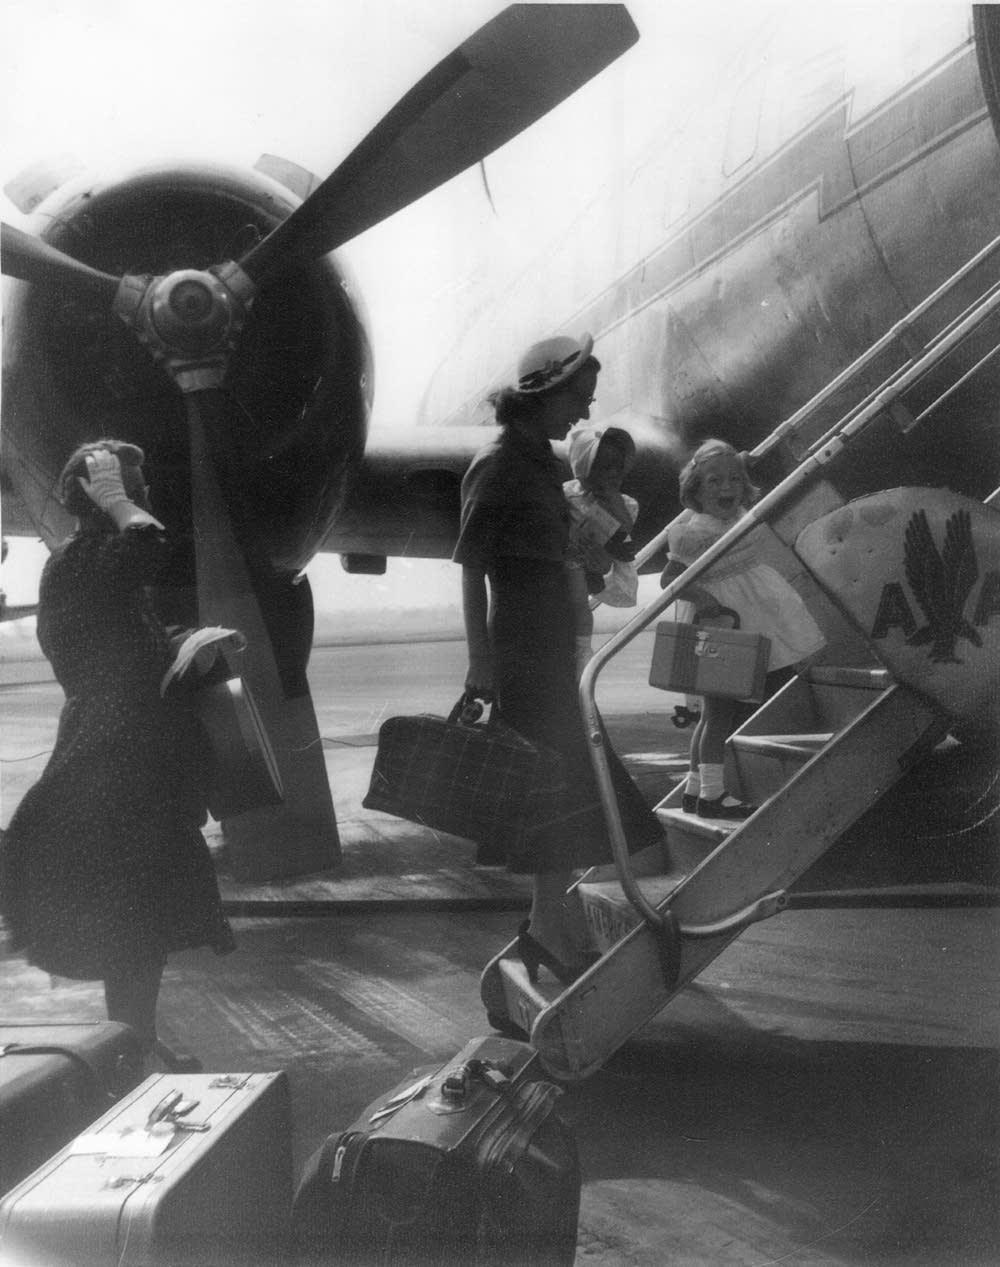 Boarding a plane, 1957